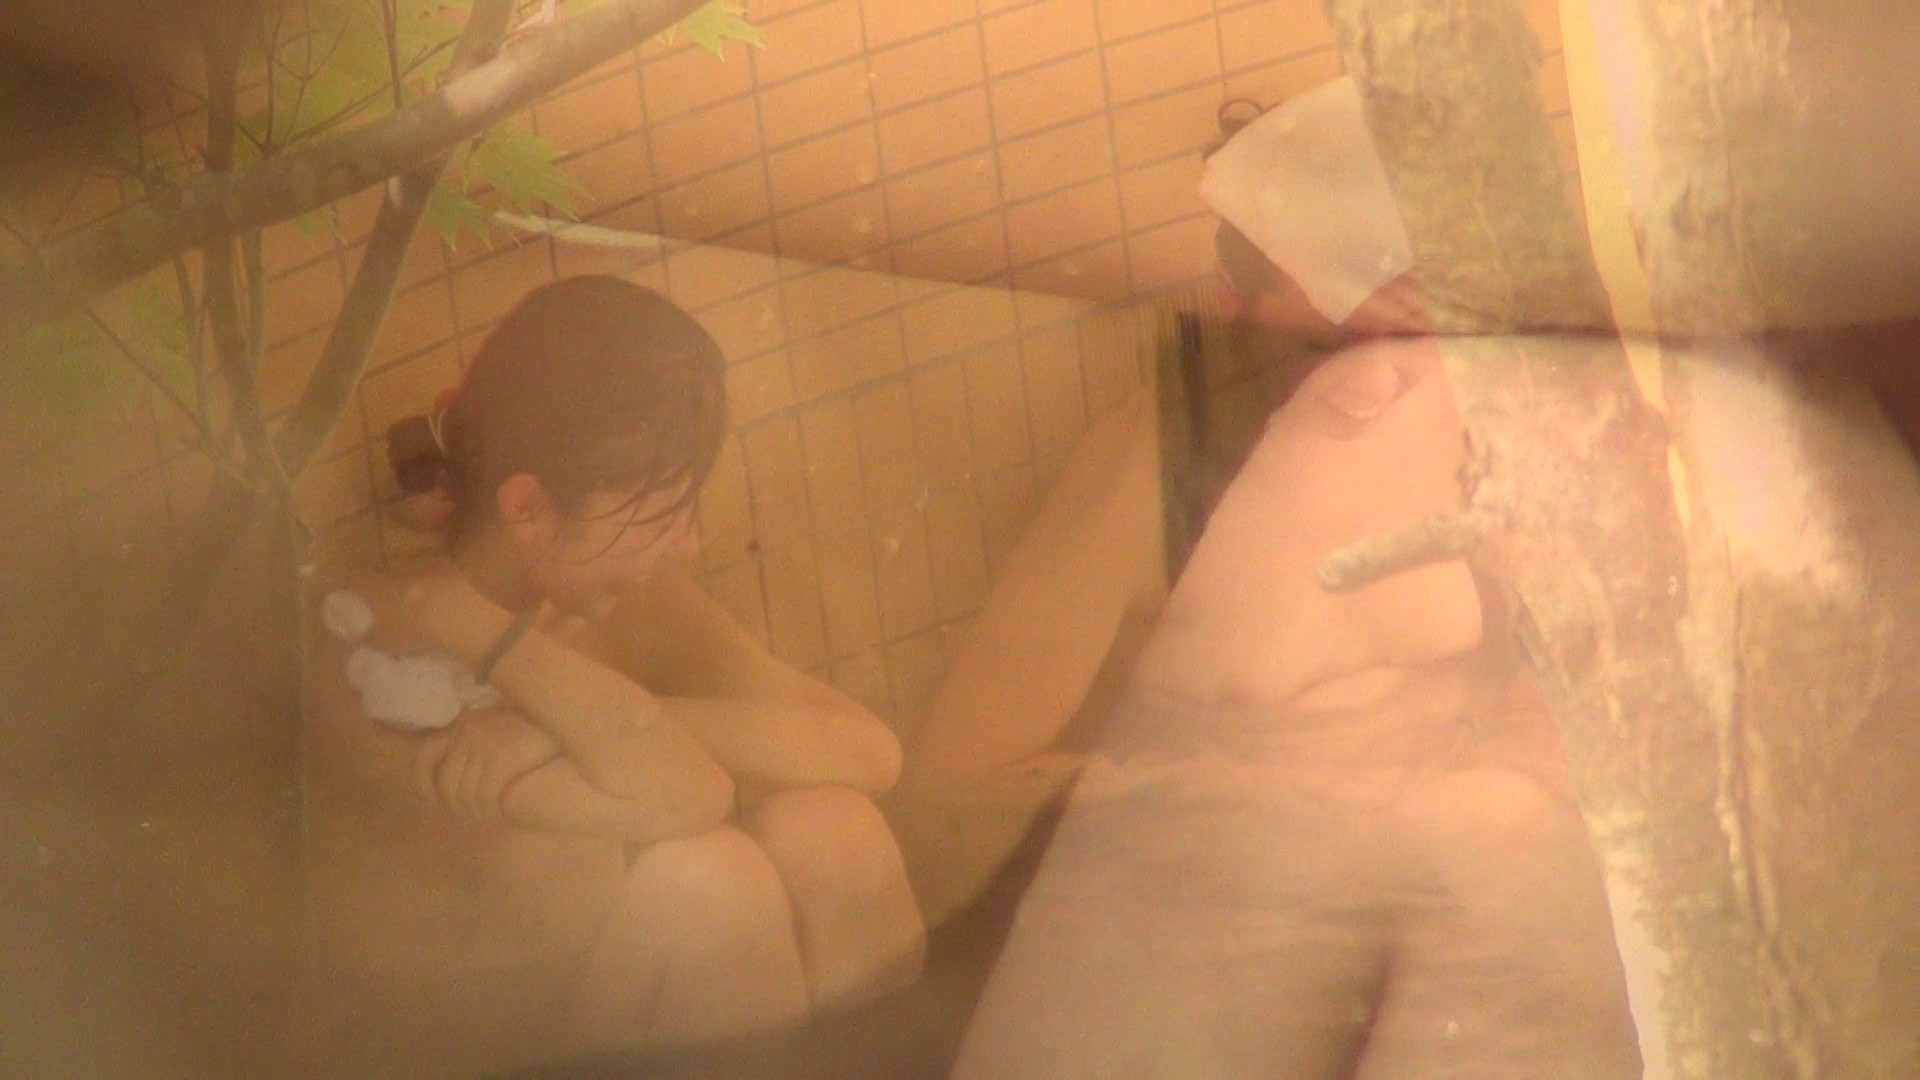 Vol.77 お上品な貧乳色白お女市さまの裸を見る醍醐味 美女 覗きオメコ動画キャプチャ 76pic 58